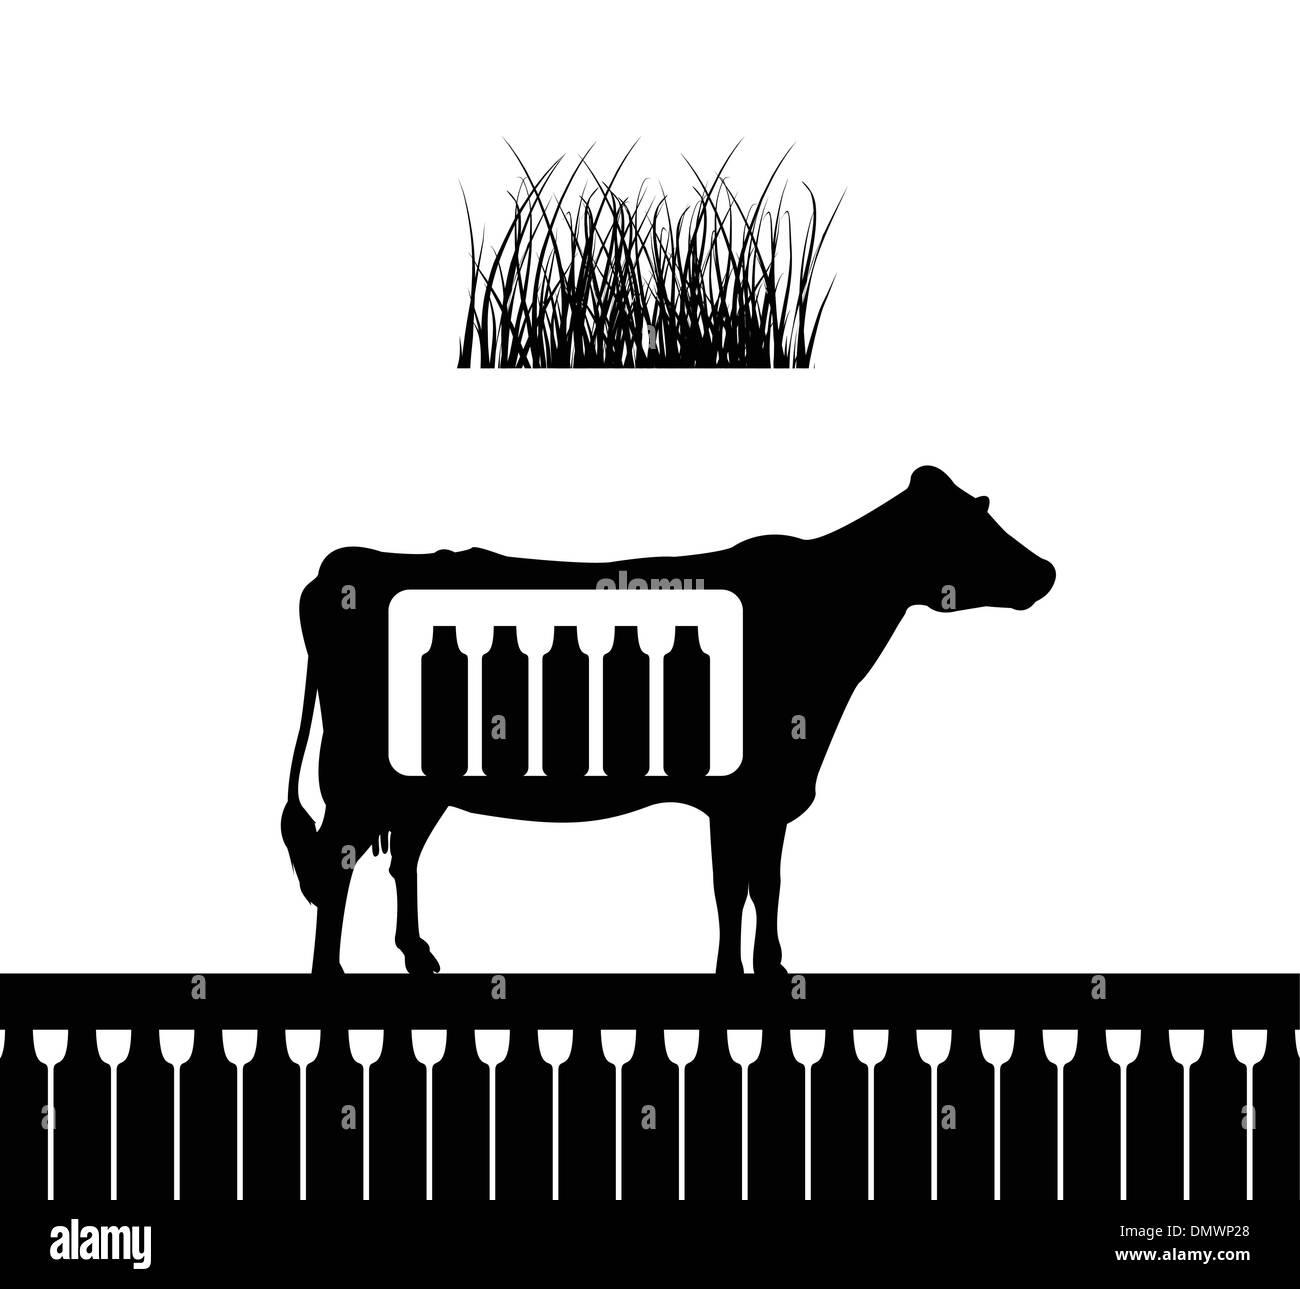 Cow4 - Stock Vector